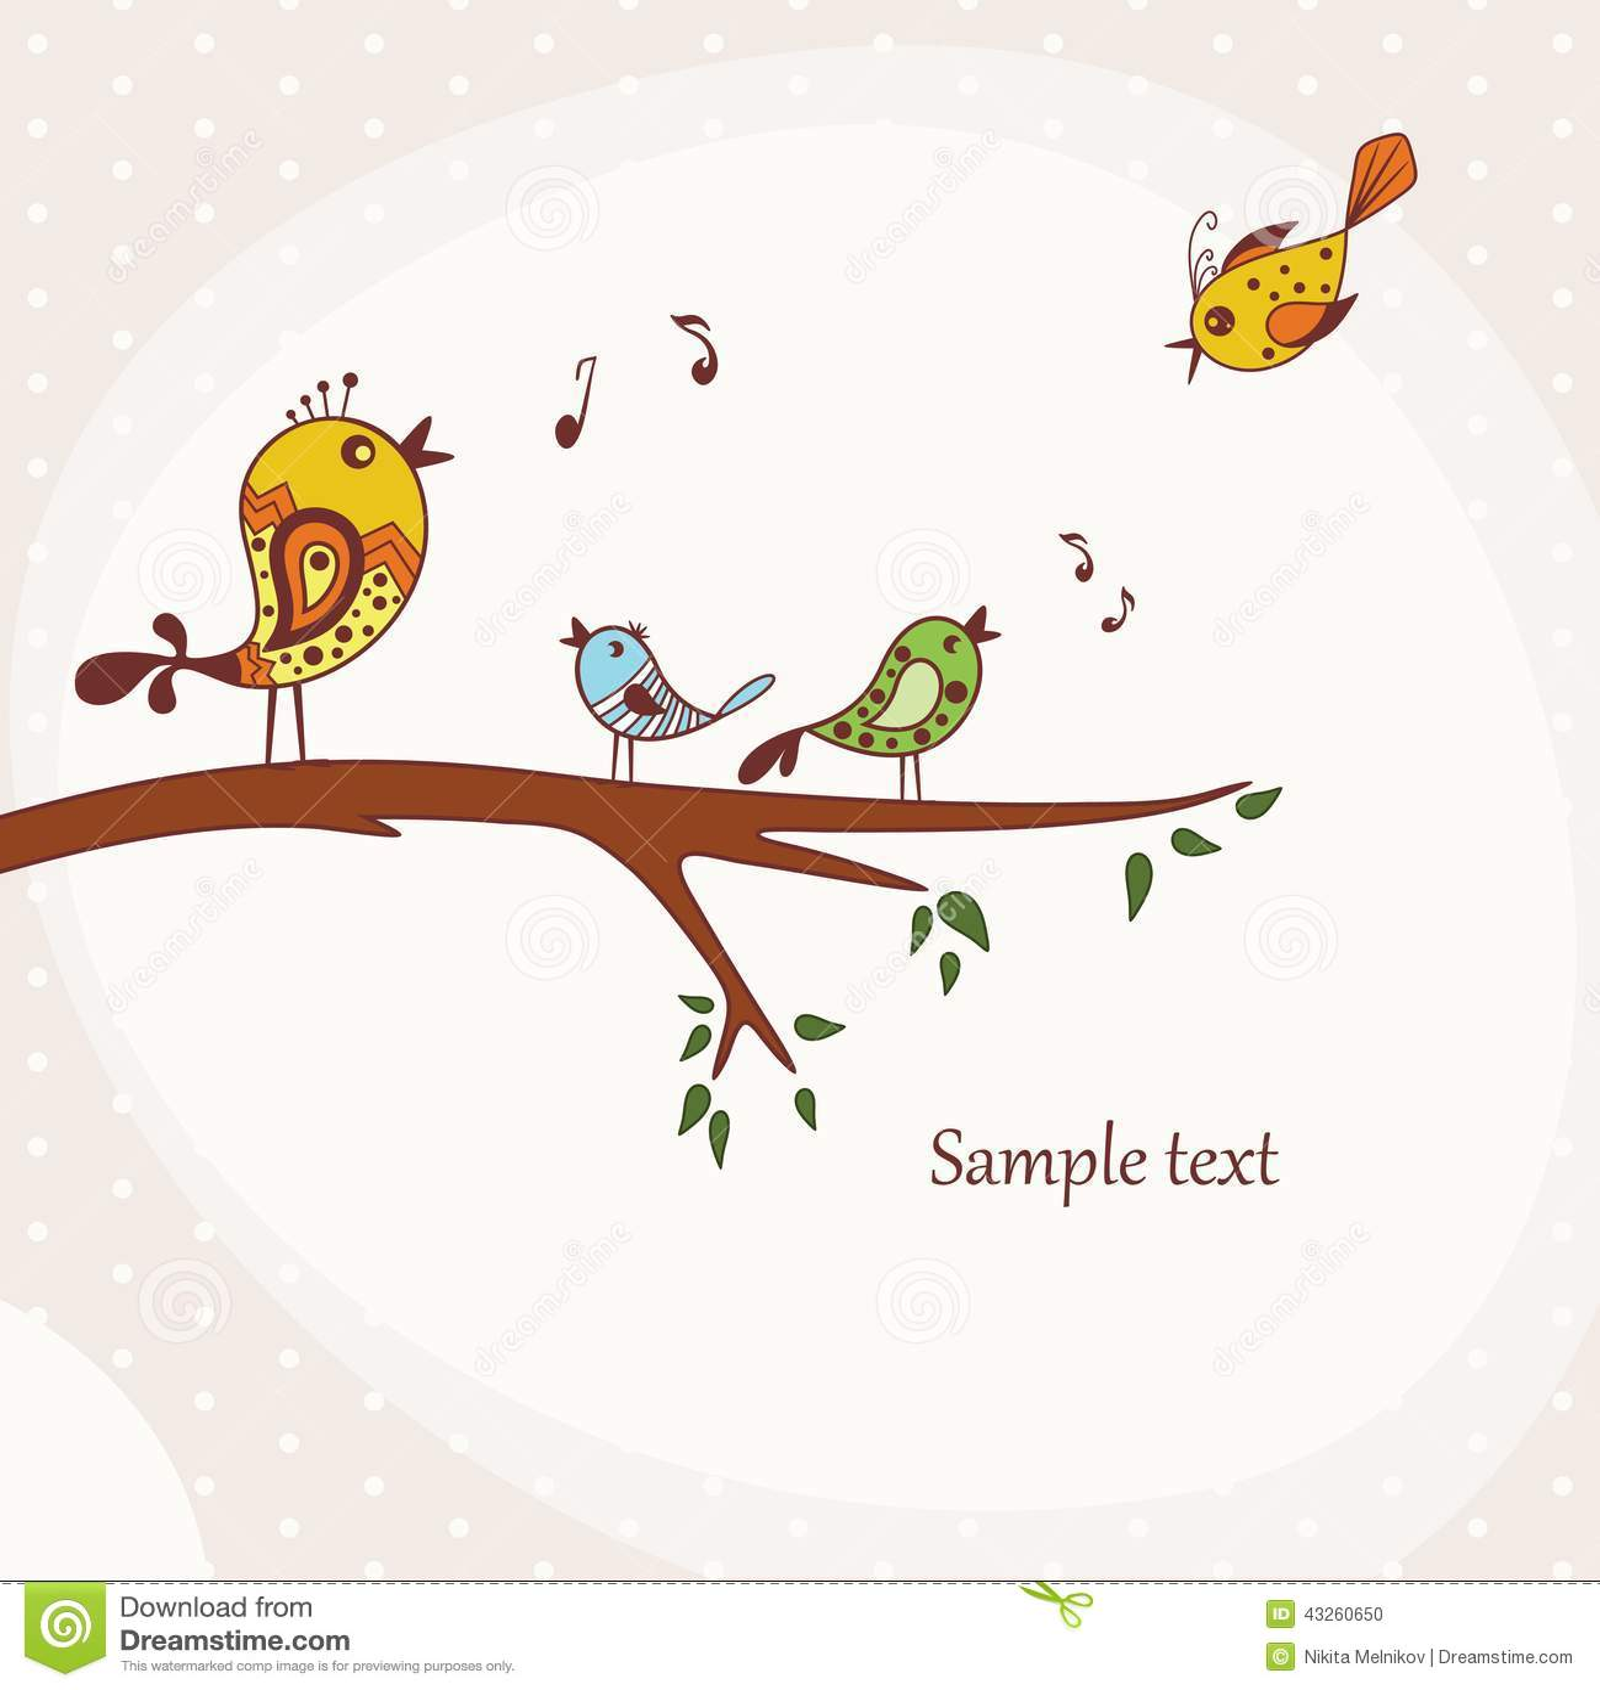 Birds Sitting Tree Branch Illustration Singing Perched Decorative Elements Happy Bird